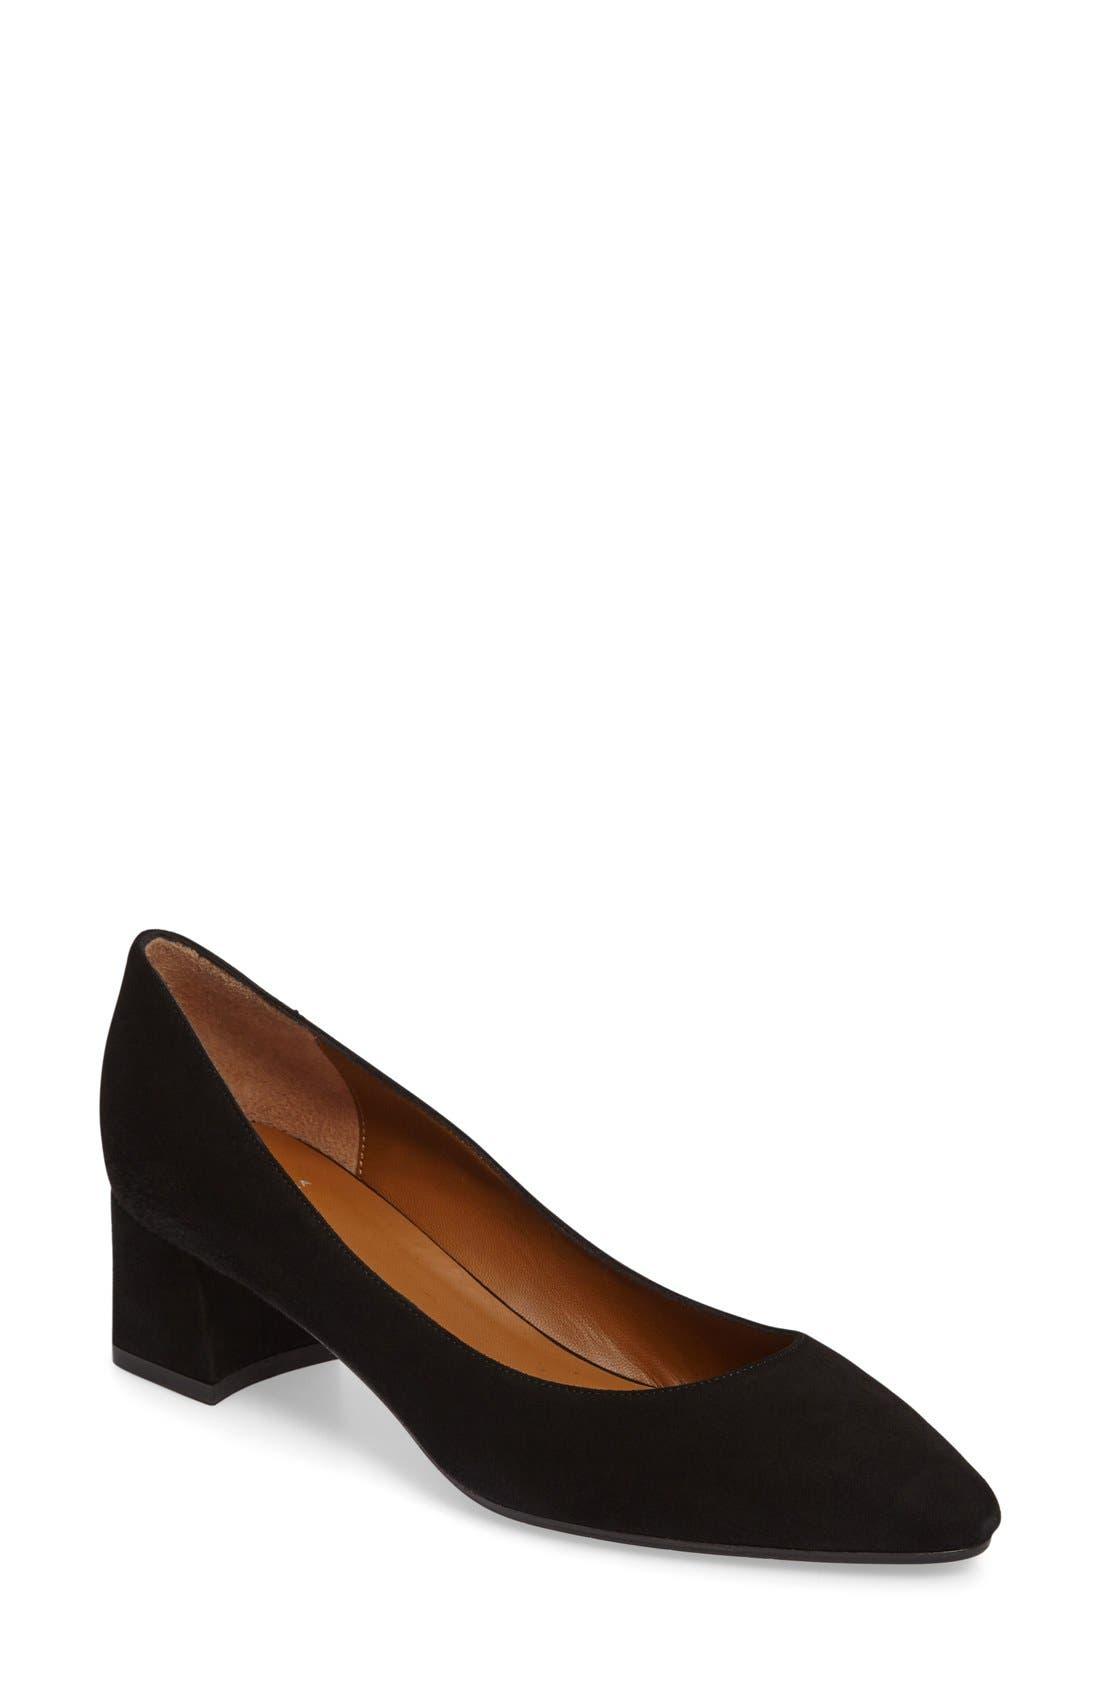 'Pheobe' Weatherproof Almond Toe Pump,                         Main,                         color, Black Suede